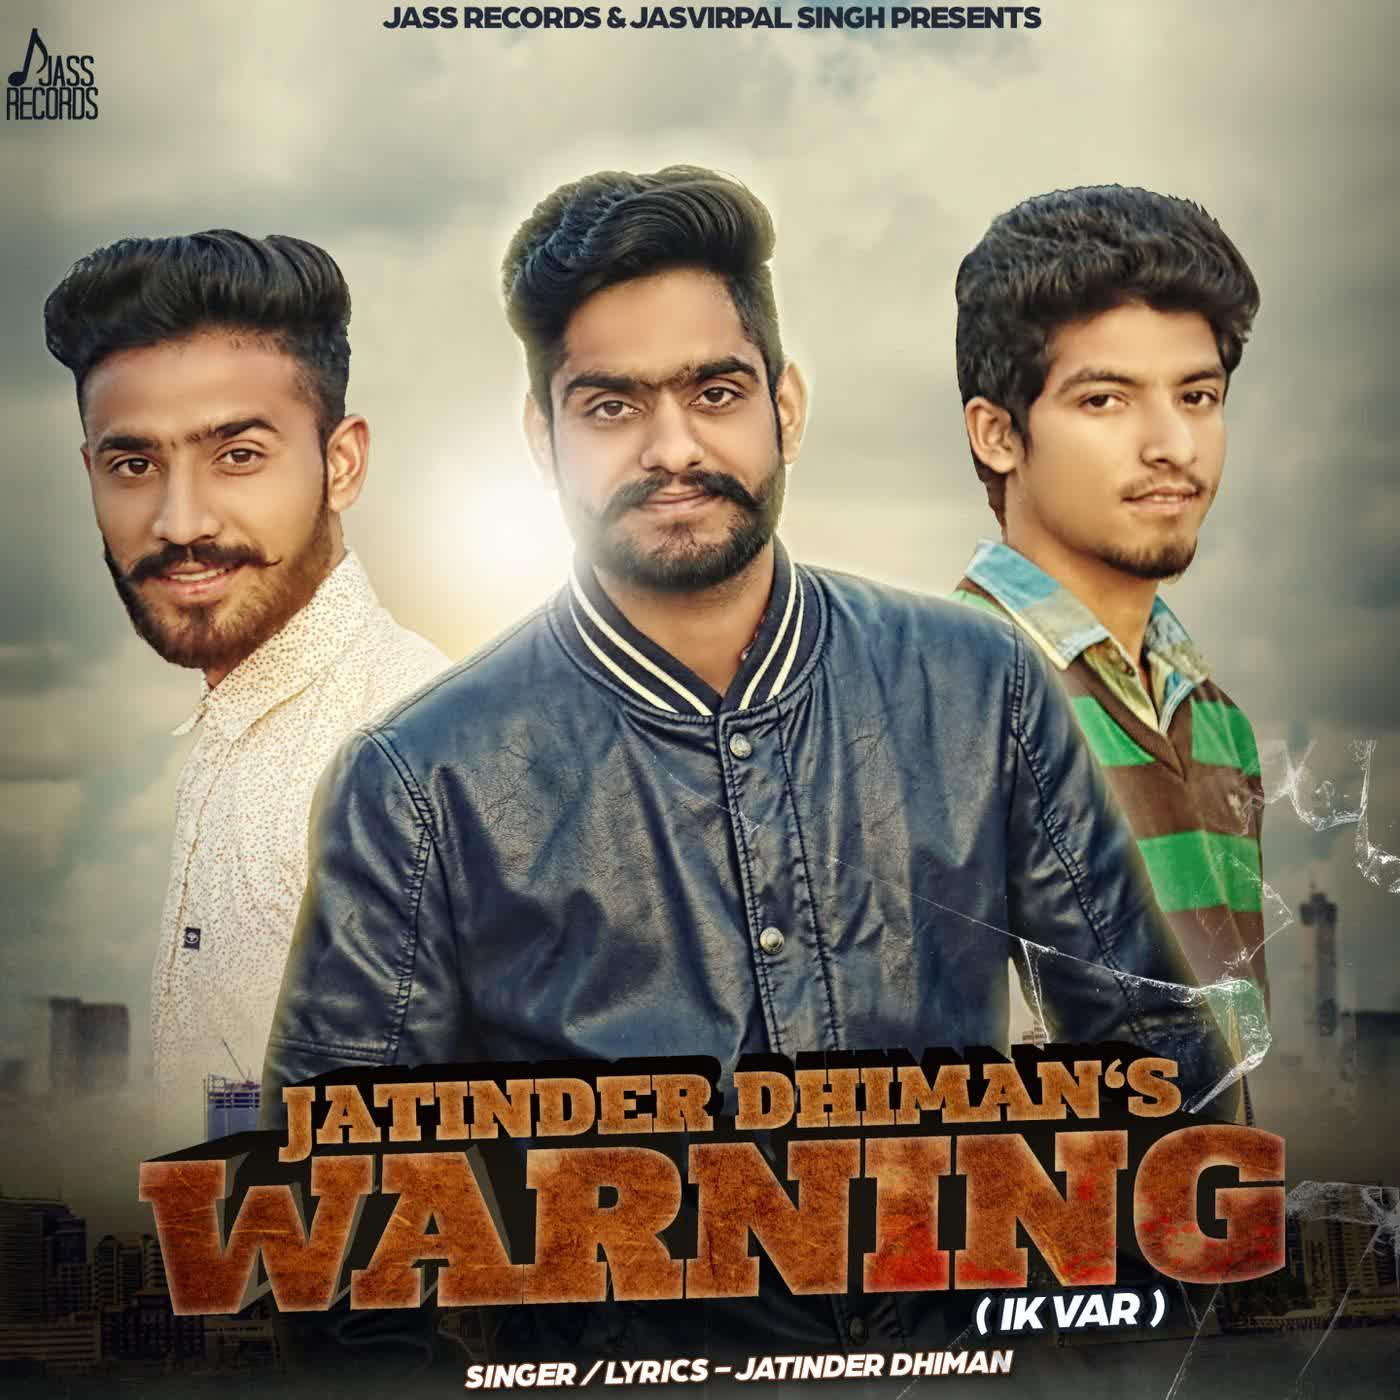 Warning (Ik Var) Jatinder Dhiman